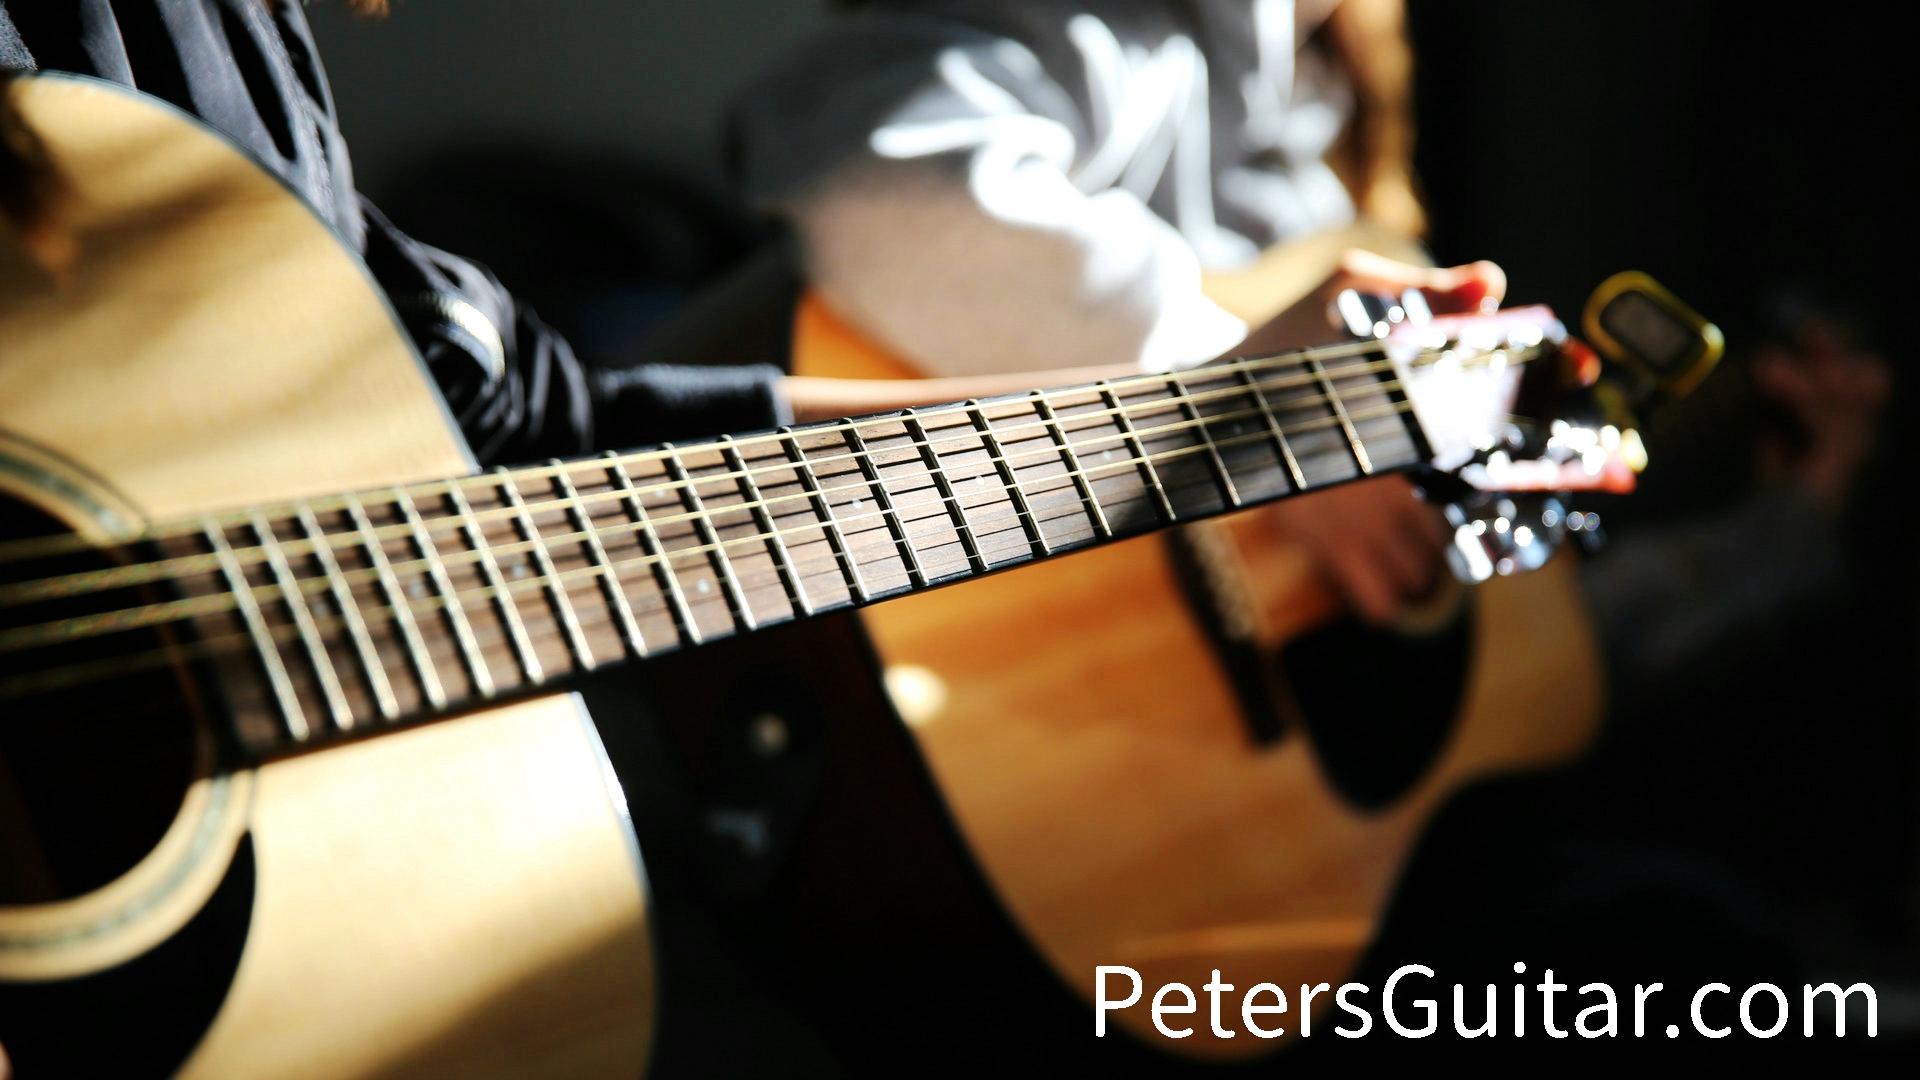 PetersGuitar_com 功夫吉他 温哥华吉他老师21.jpg